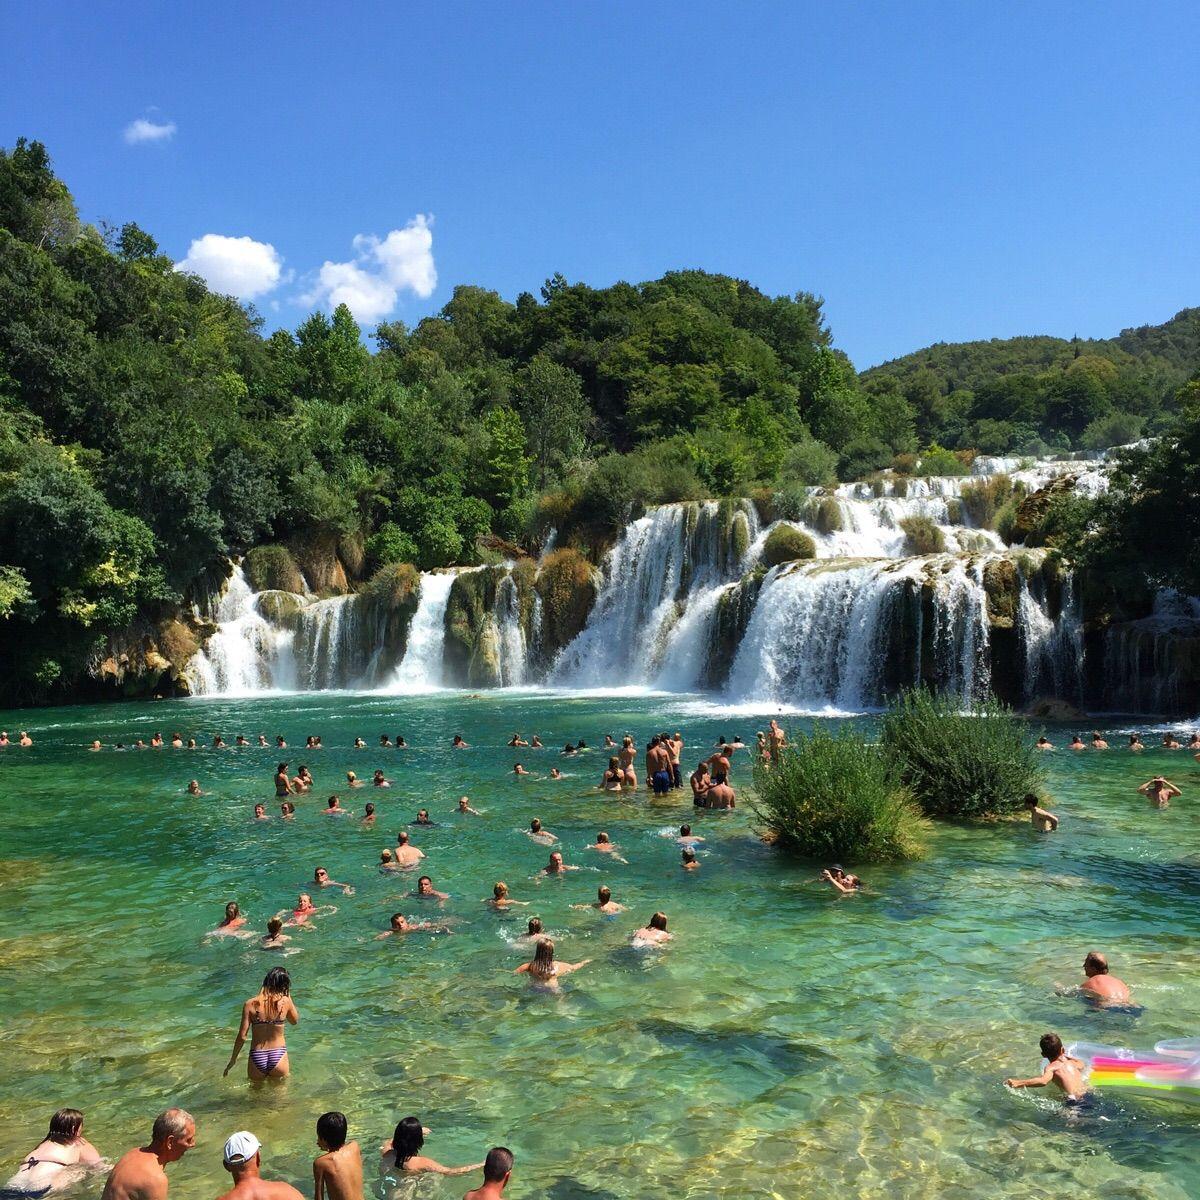 Krka national park in Croatia was breathtaking